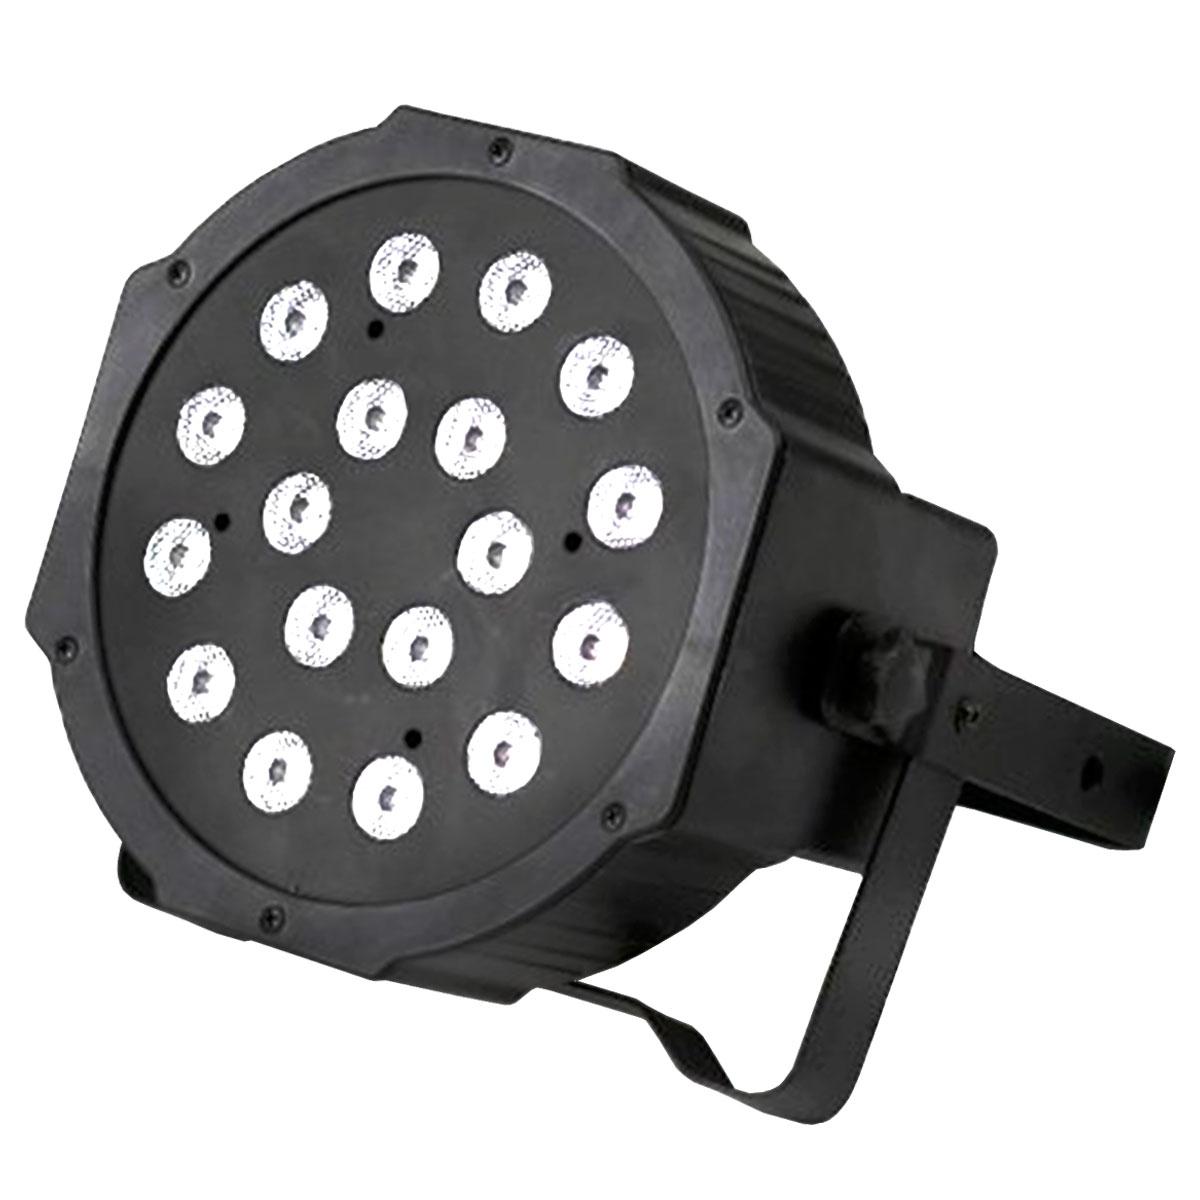 SP19 - Canh�o de LED Par64 RGB 1W SP 19 - Spectrum